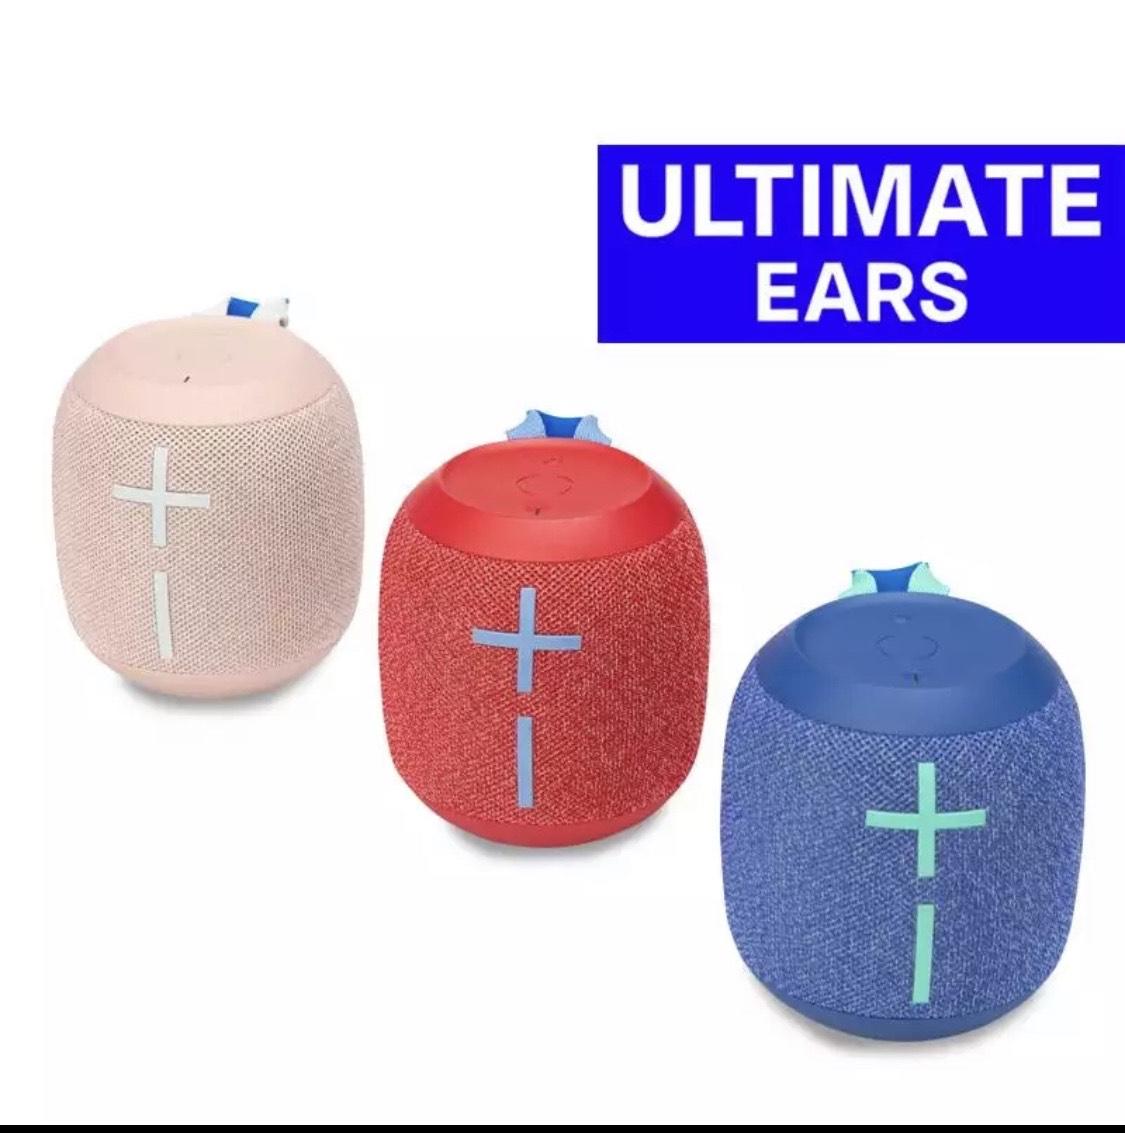 Wonderboom 2 (Ultimate Ears) altavoz inalámbrico